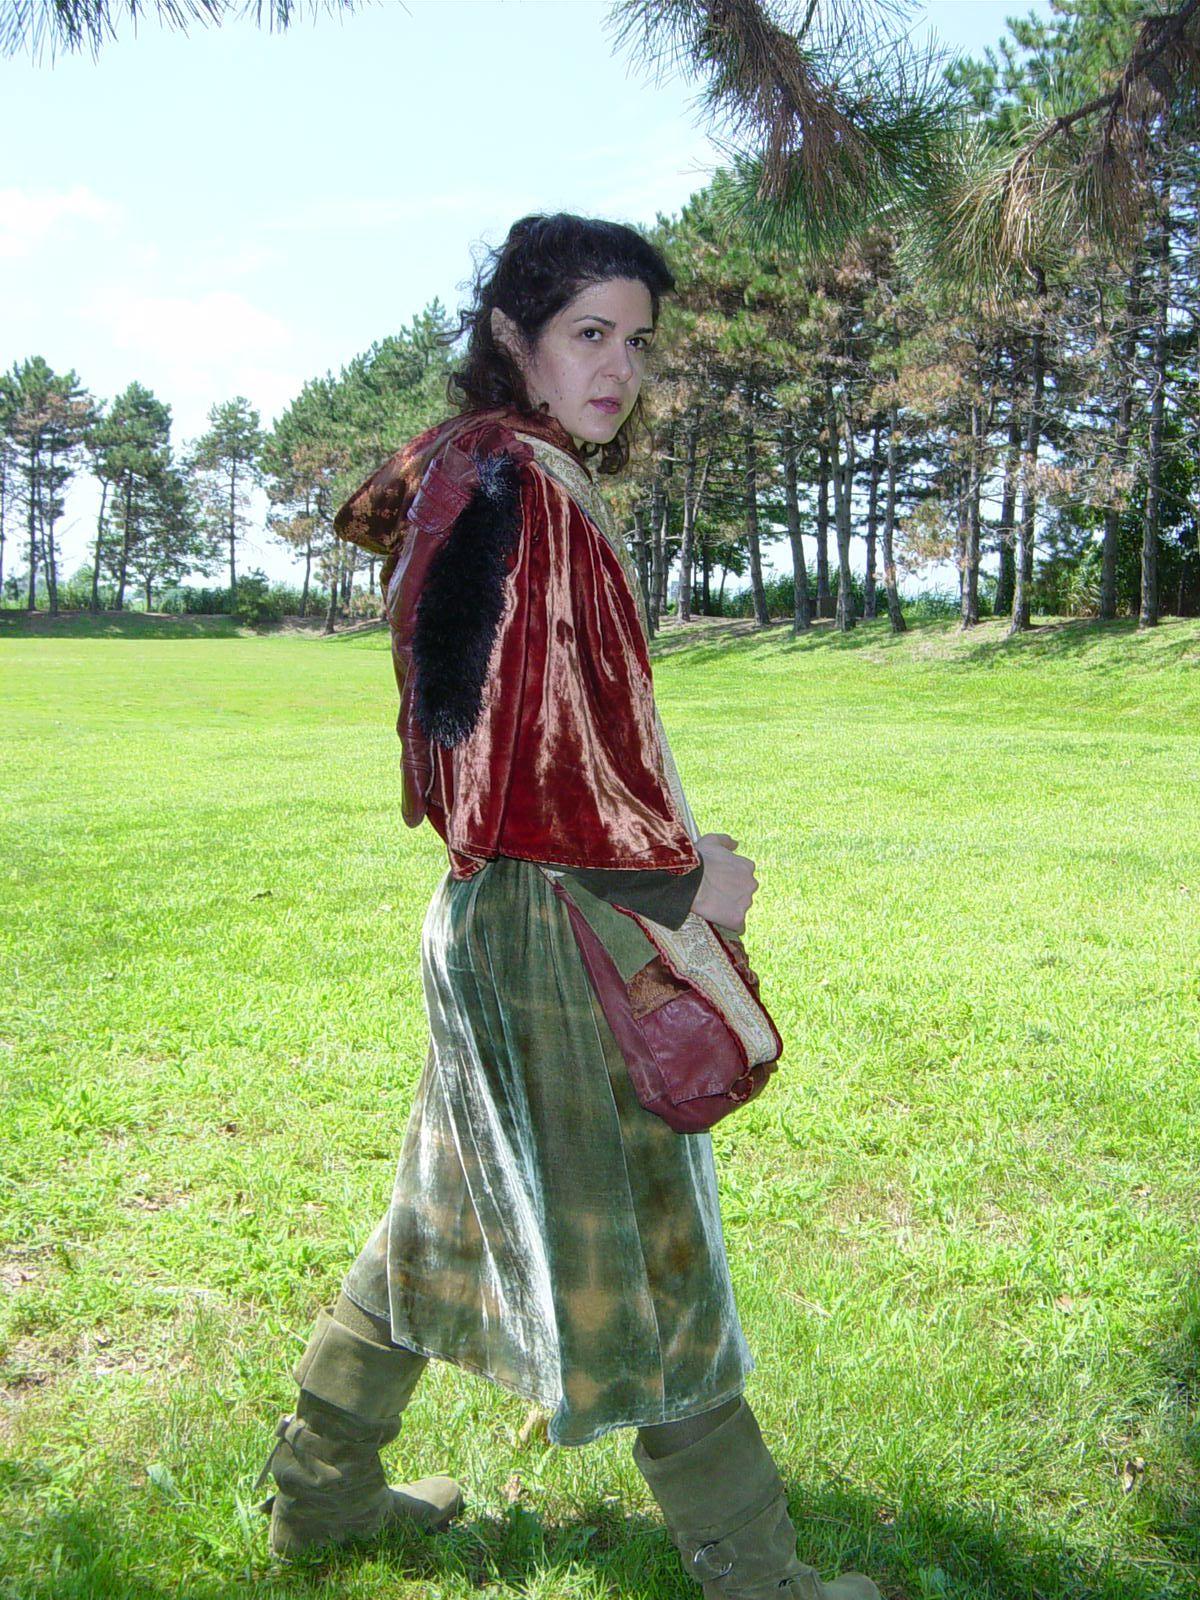 Anna of Mirkwoodside walking through a meadow